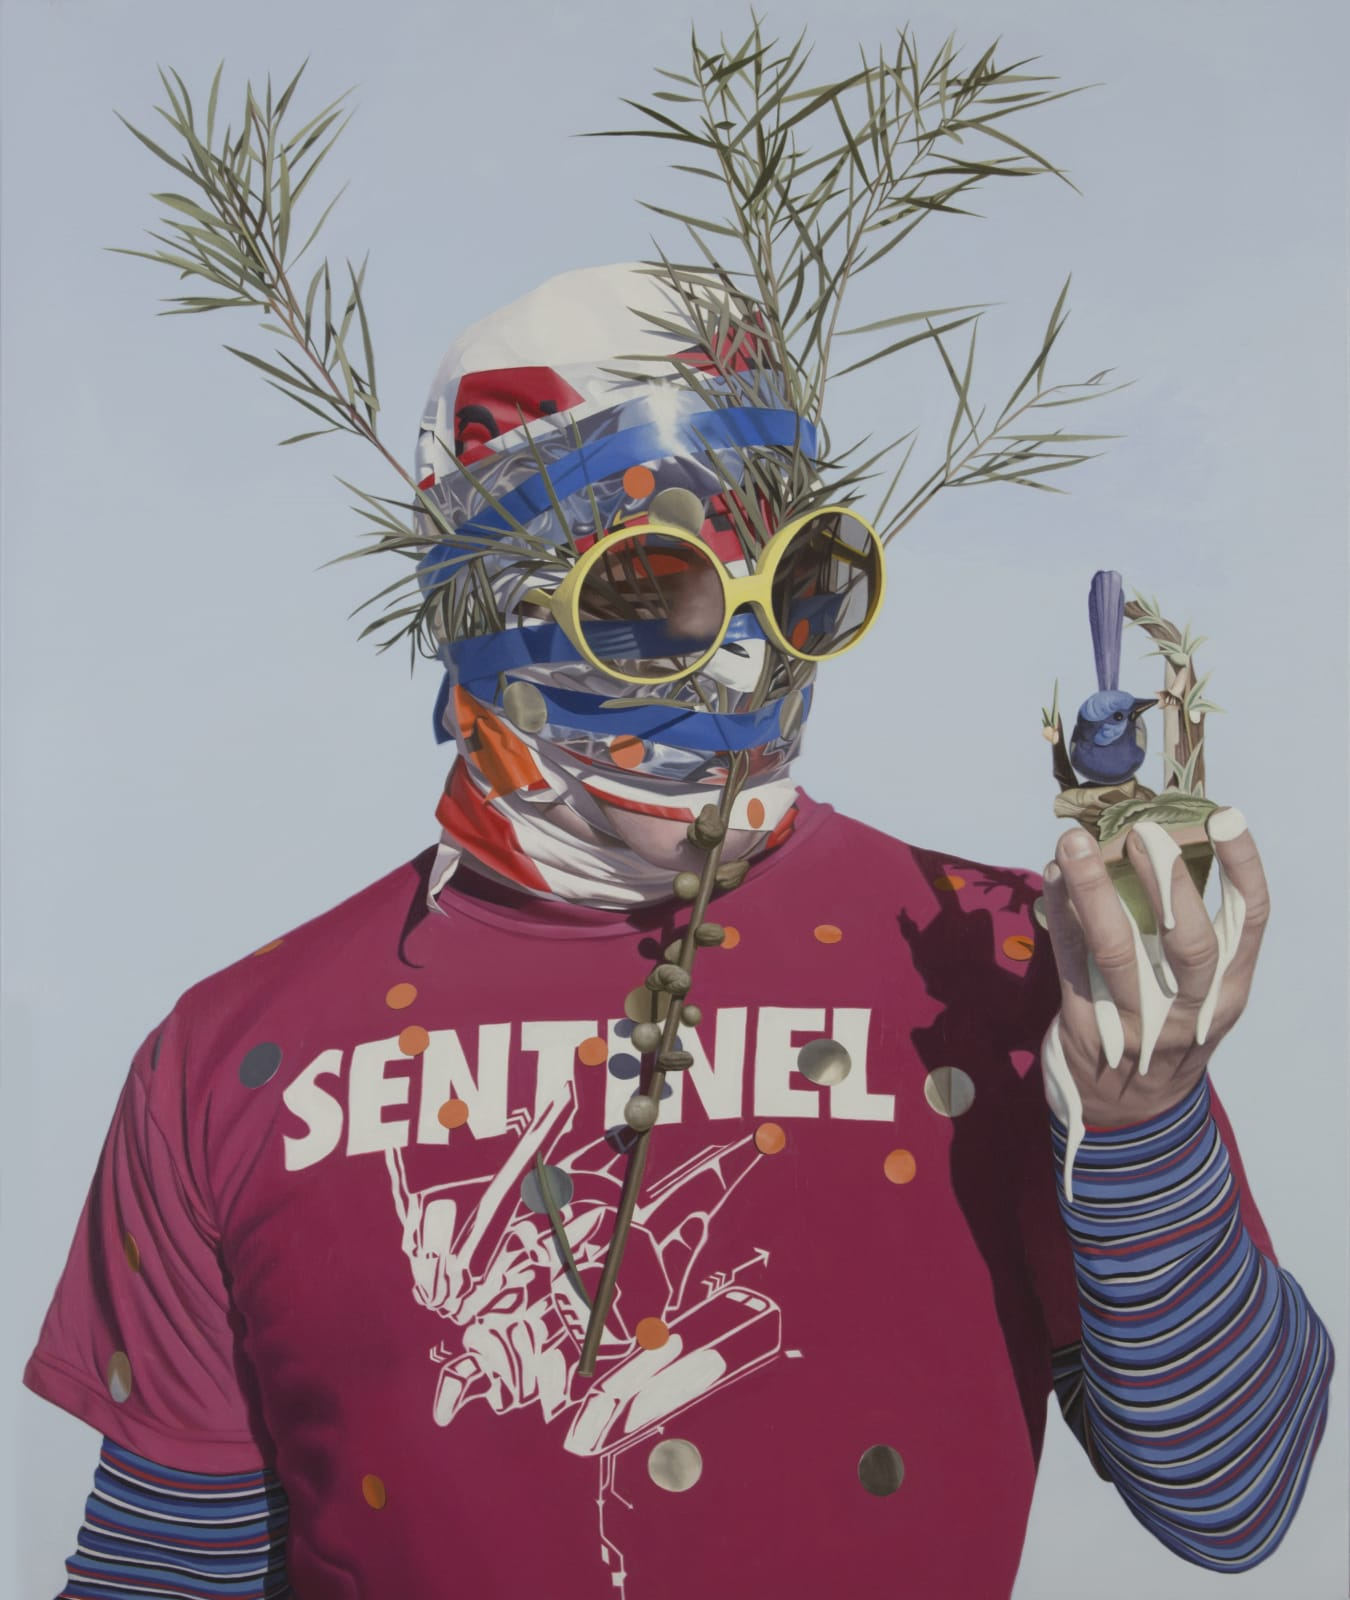 Juan Ford, Sentinel, 2018